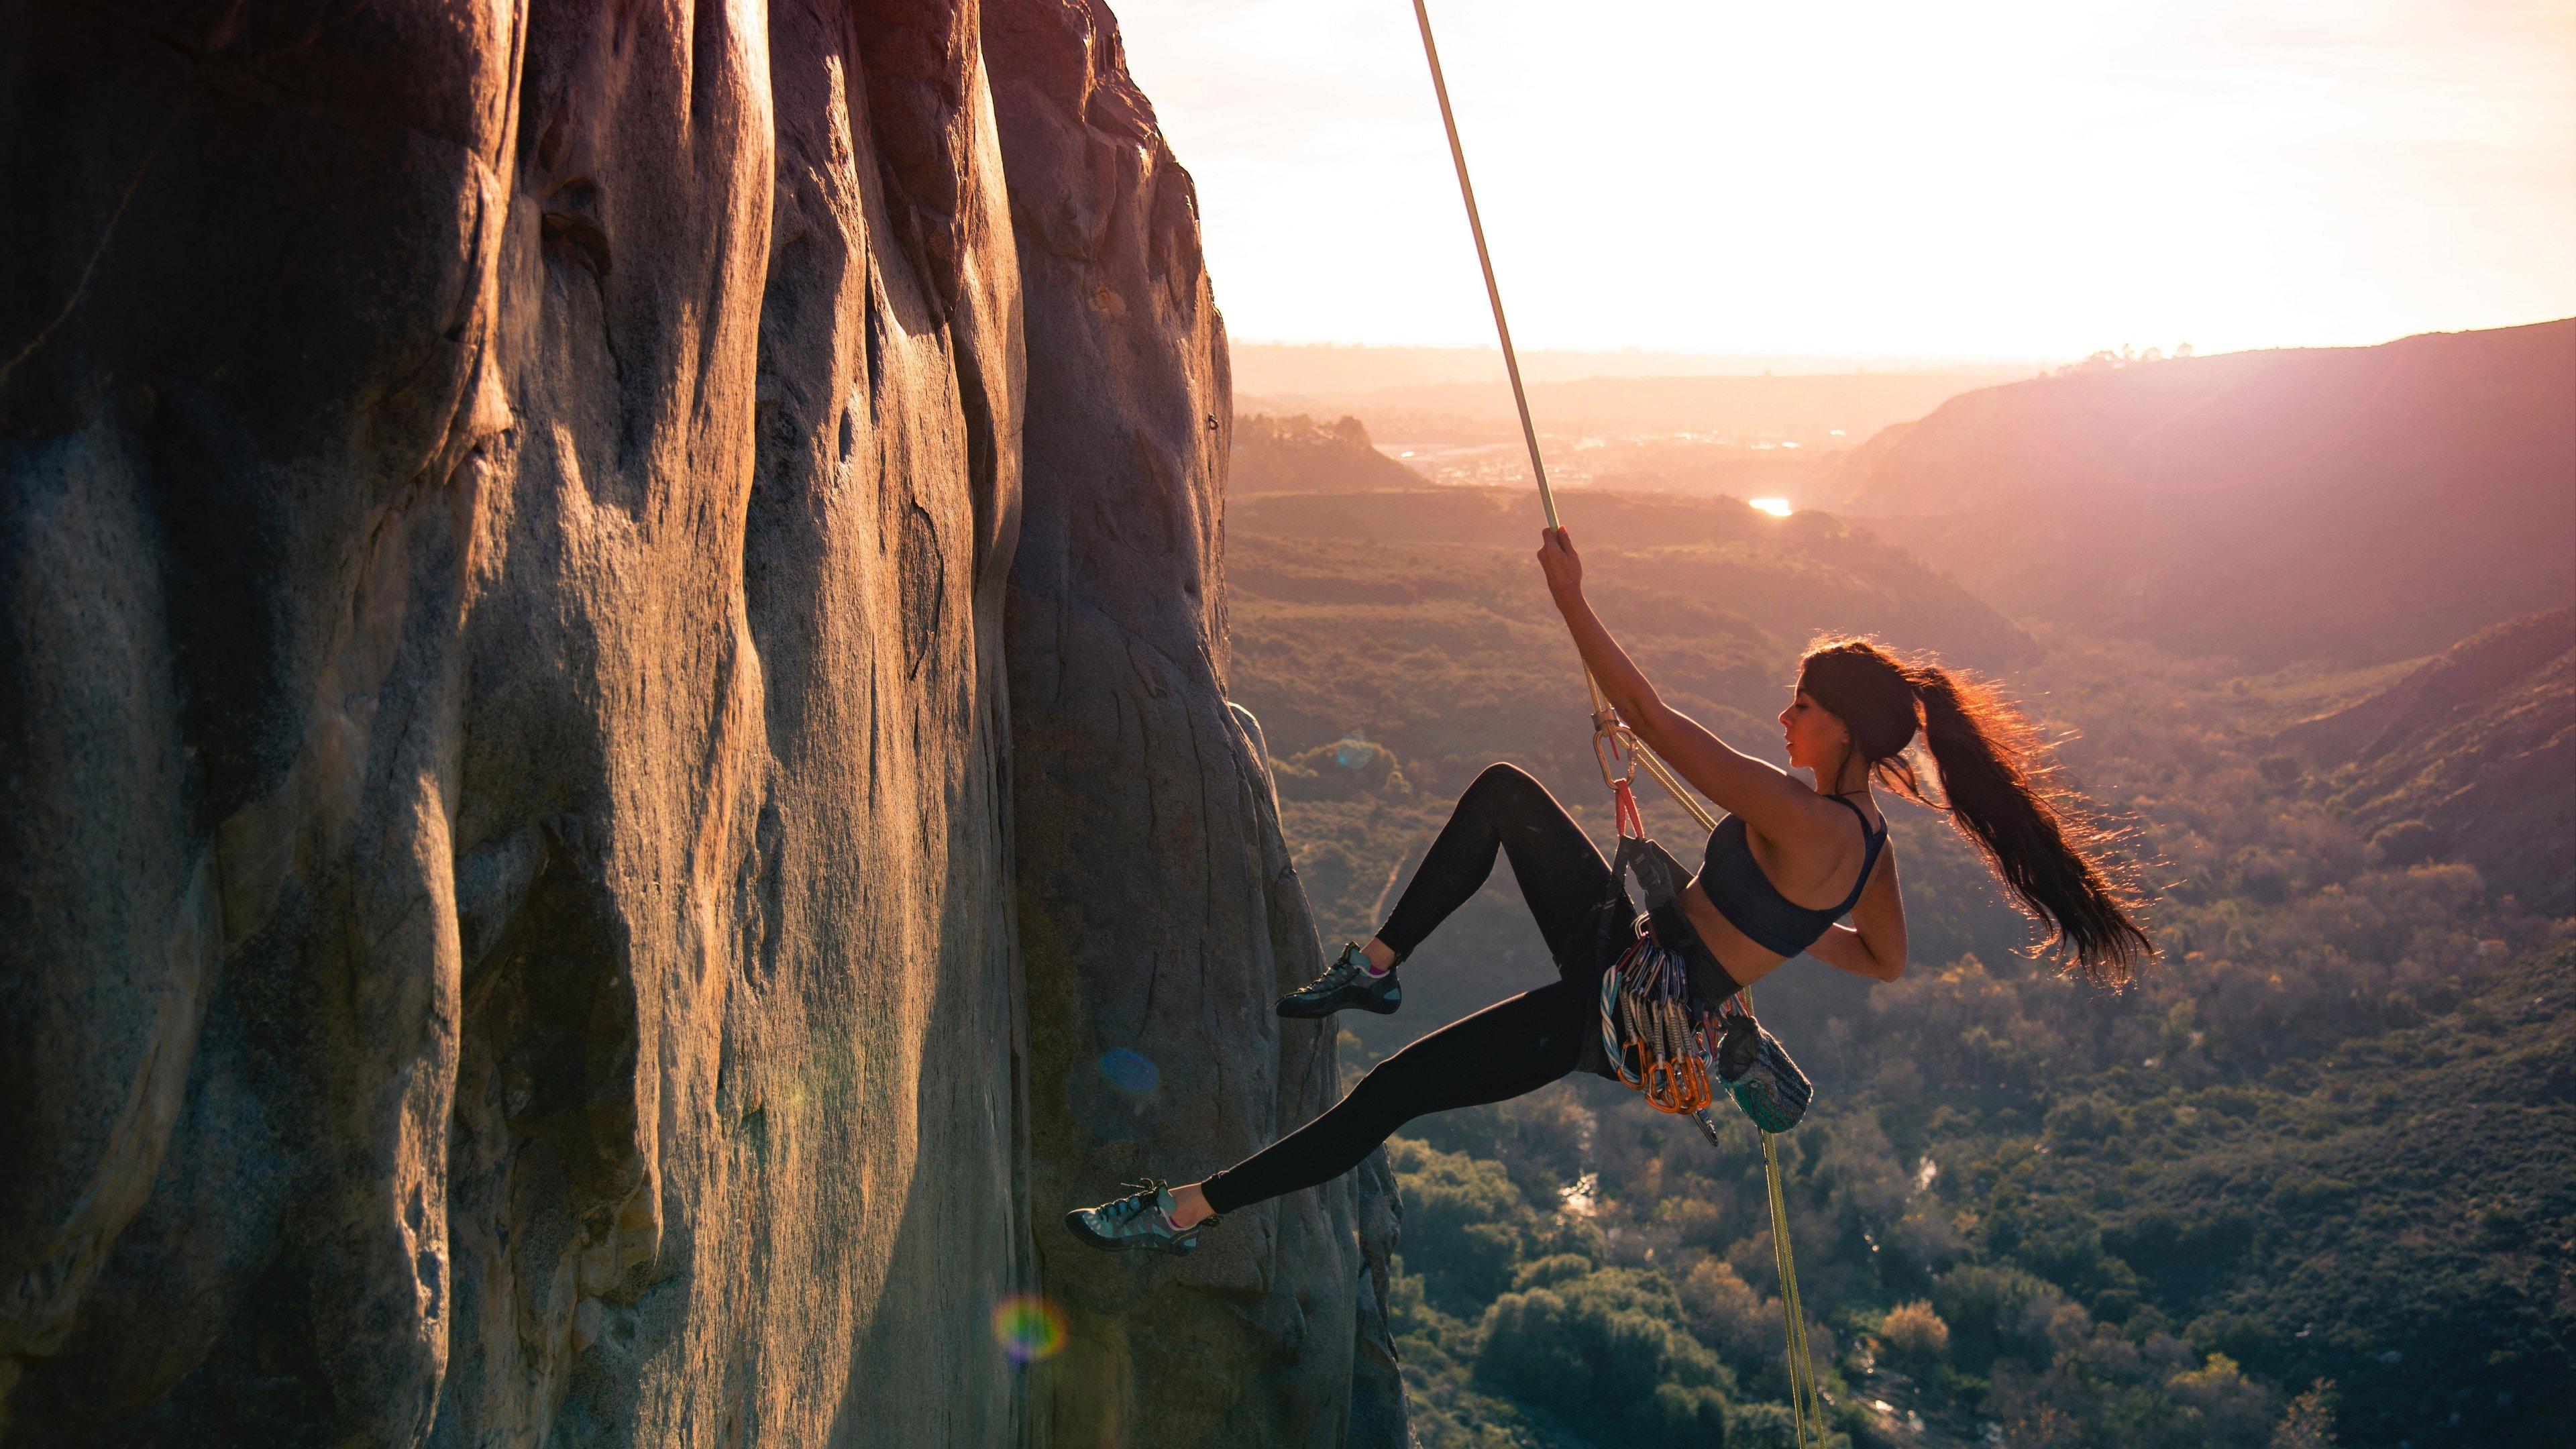 girl mountain climber 5k 1538786999 - Girl Mountain Climber 5k - sports wallpapers, mountains wallpapers, mountain climbing wallpapers, hd-wallpapers, girl wallpapers, 5k wallpapers, 4k-wallpapers